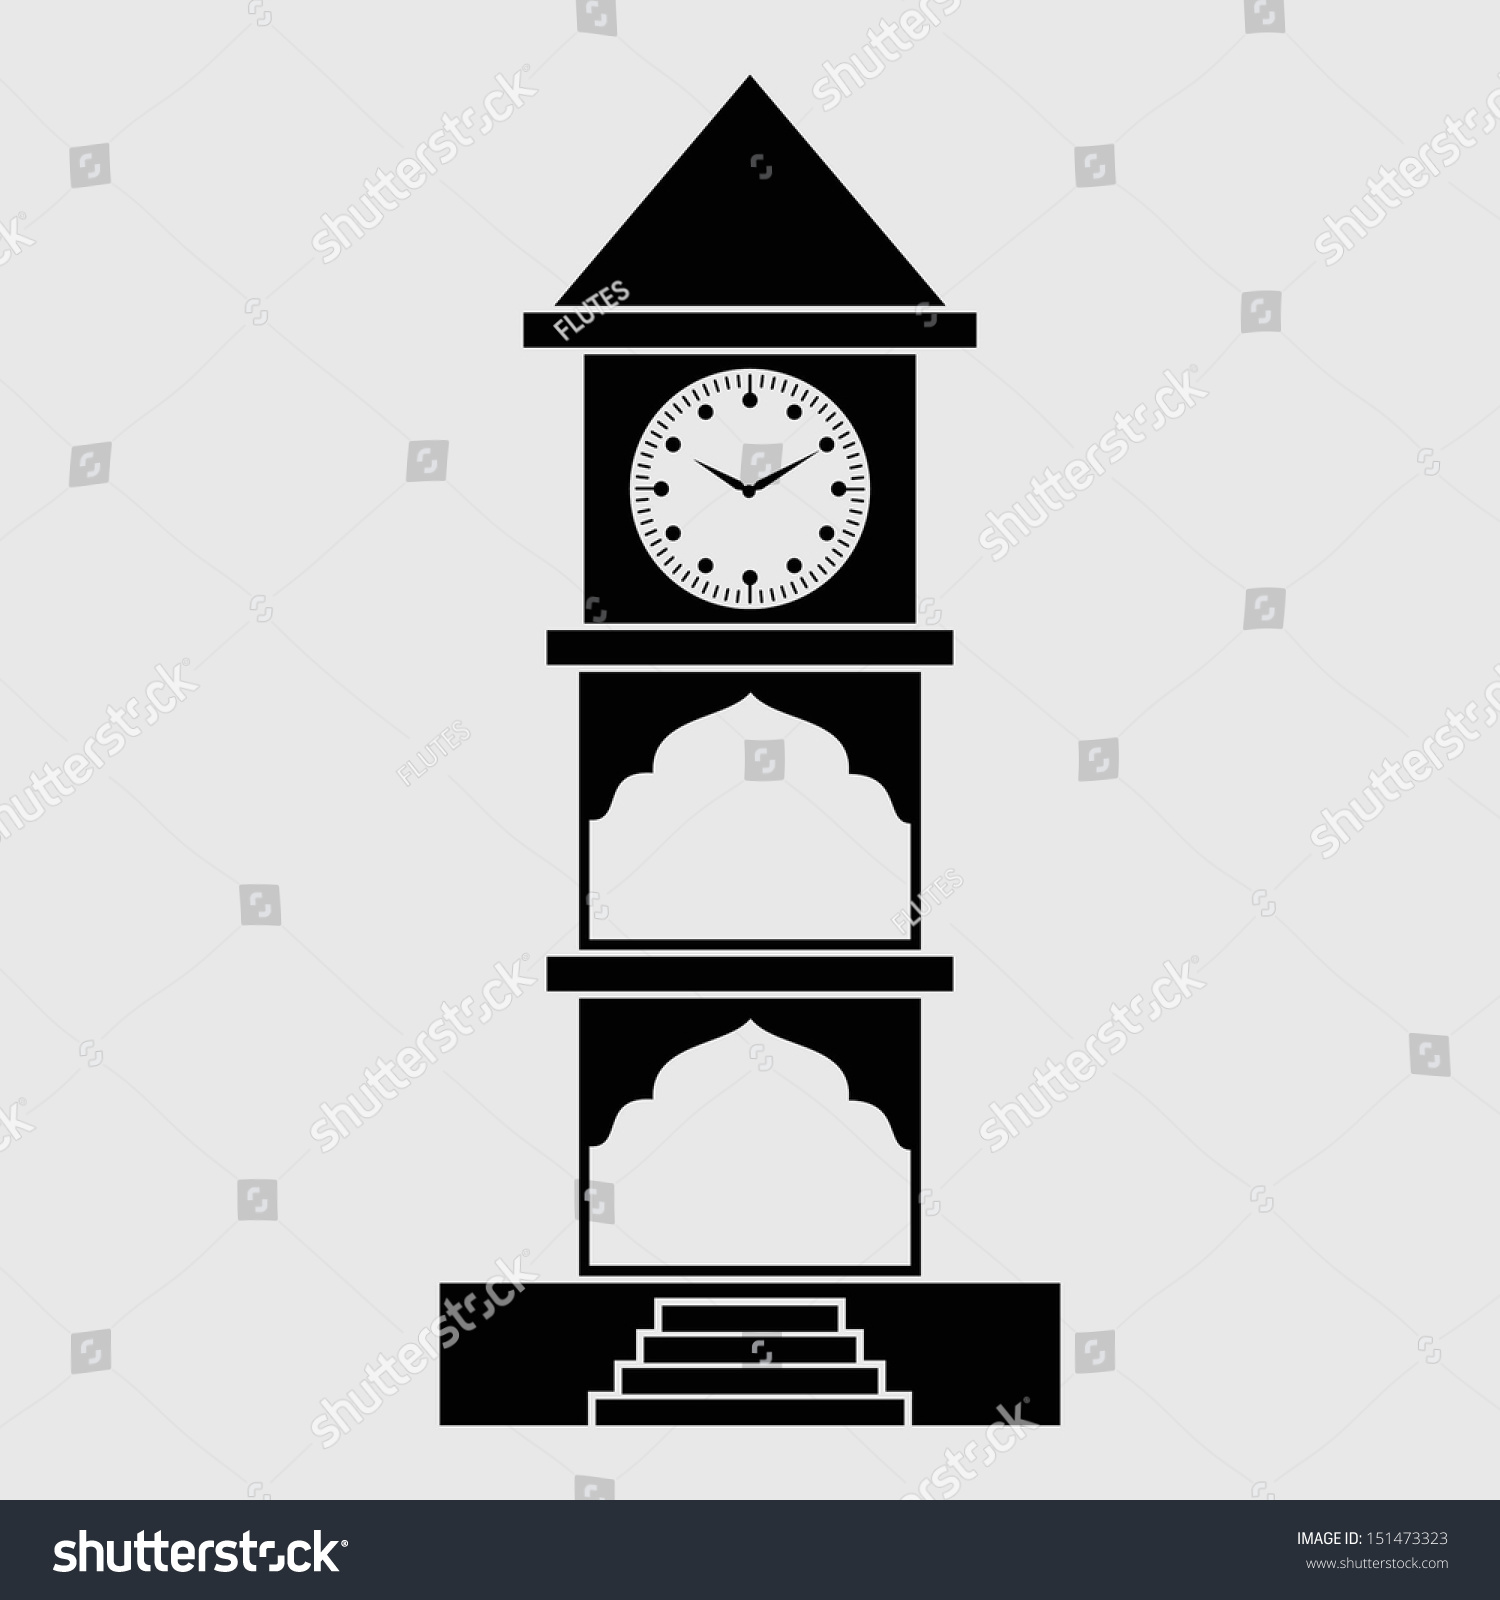 clip art clock tower - photo #18